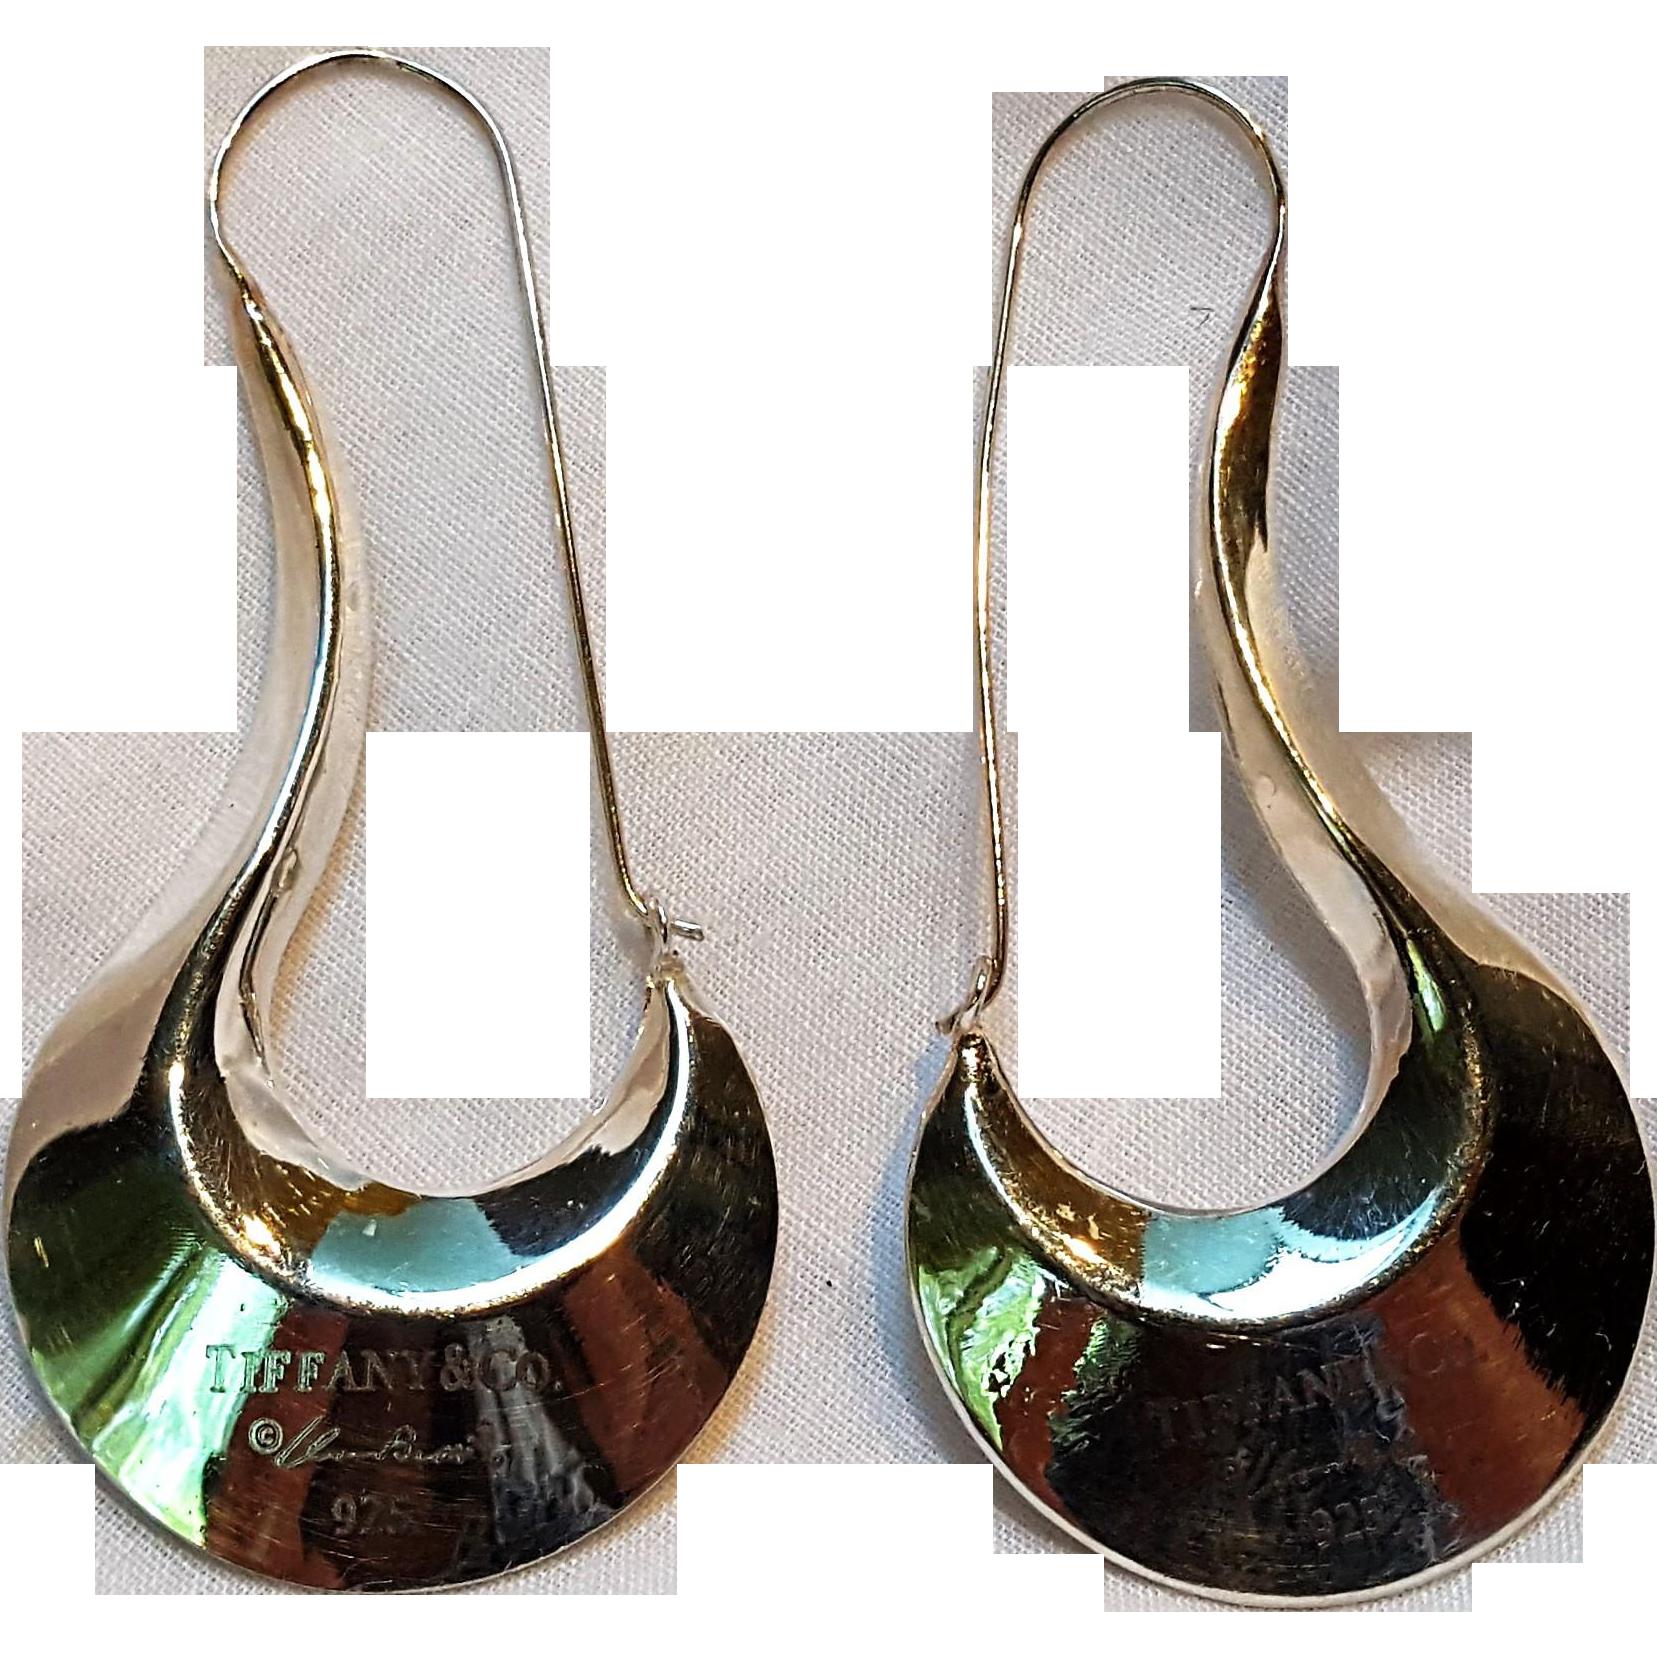 Tiffany & Company  Co Elsa Peretti sterling silver Modernist earrings